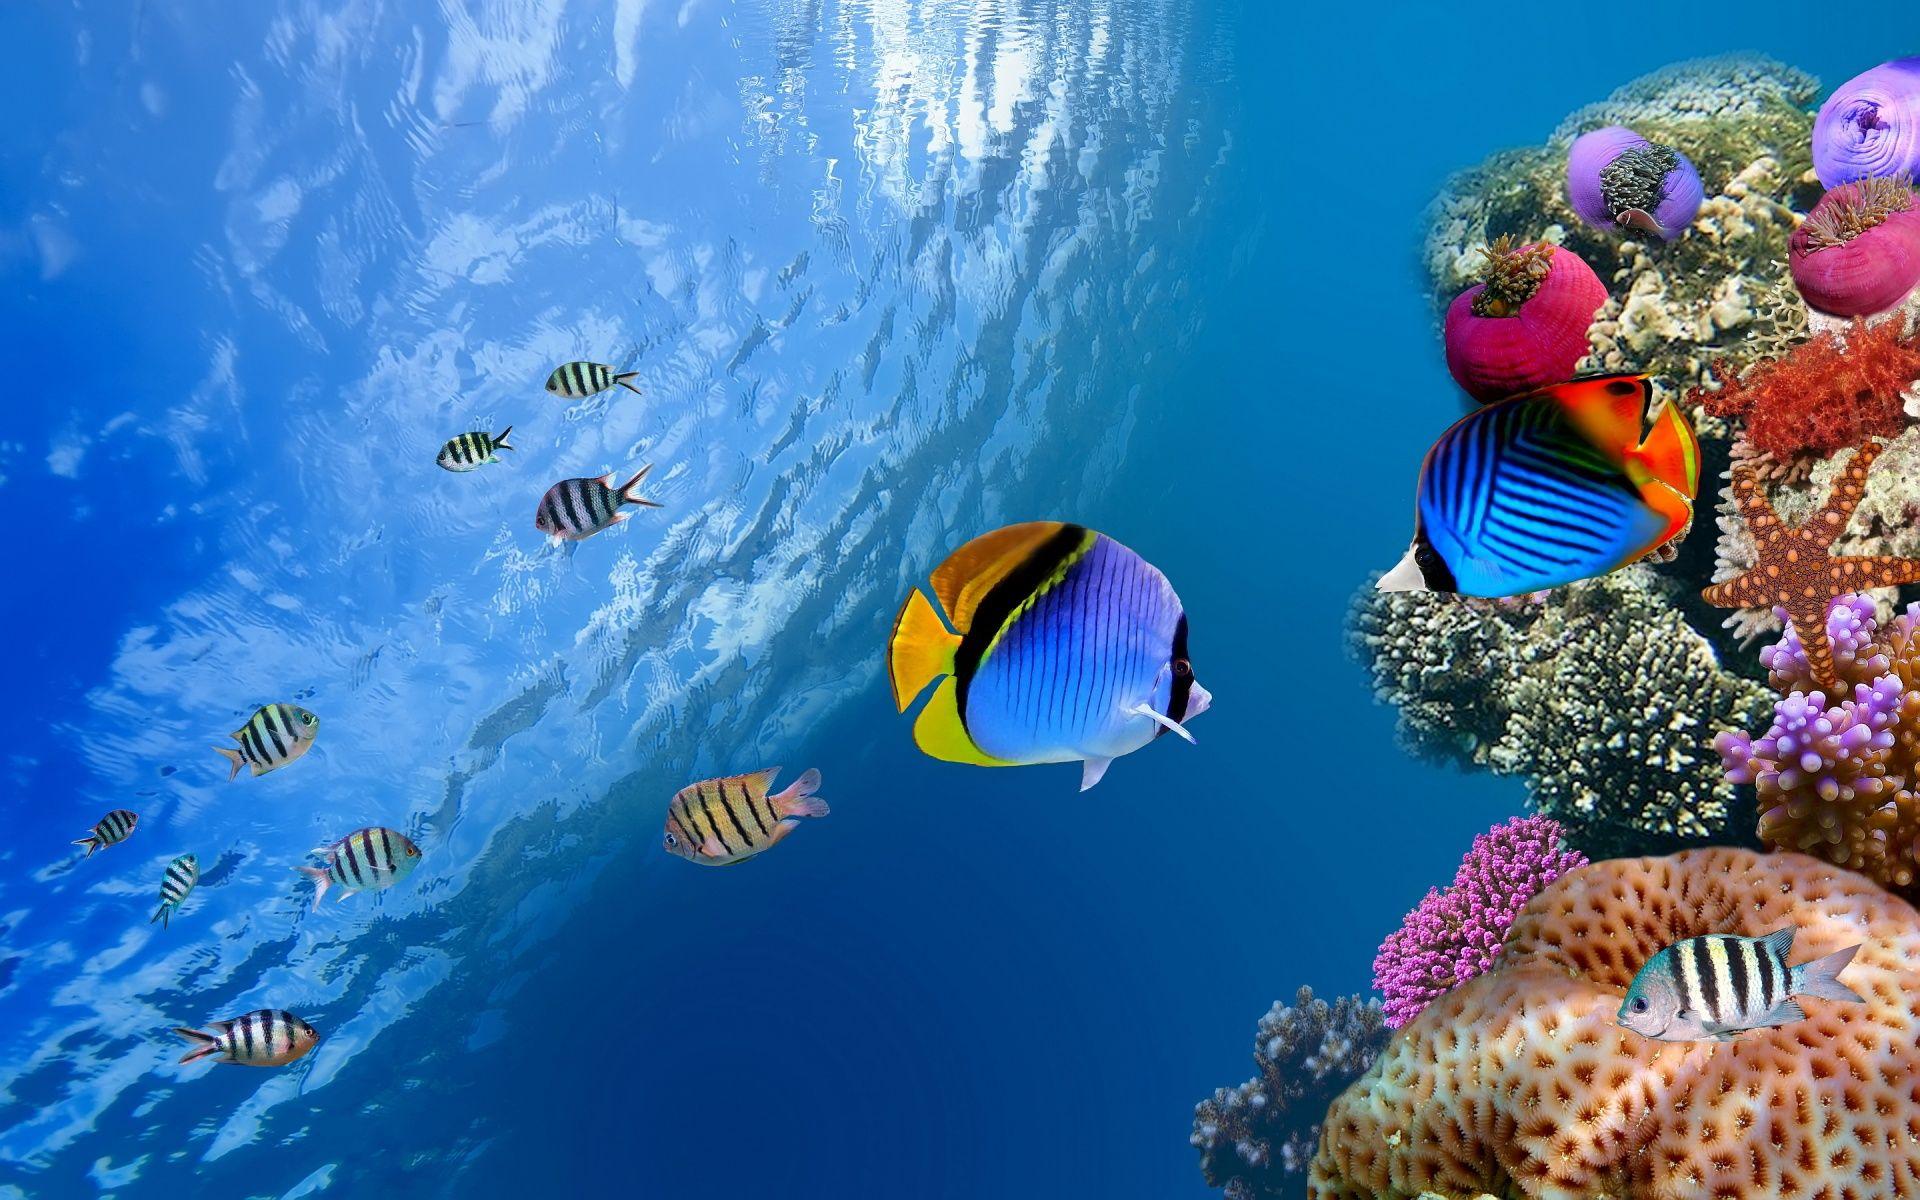 Fish corals underwater ocean tropical sea g wallpaper x fish corals underwater ocean tropical sea g wallpaper x voltagebd Choice Image